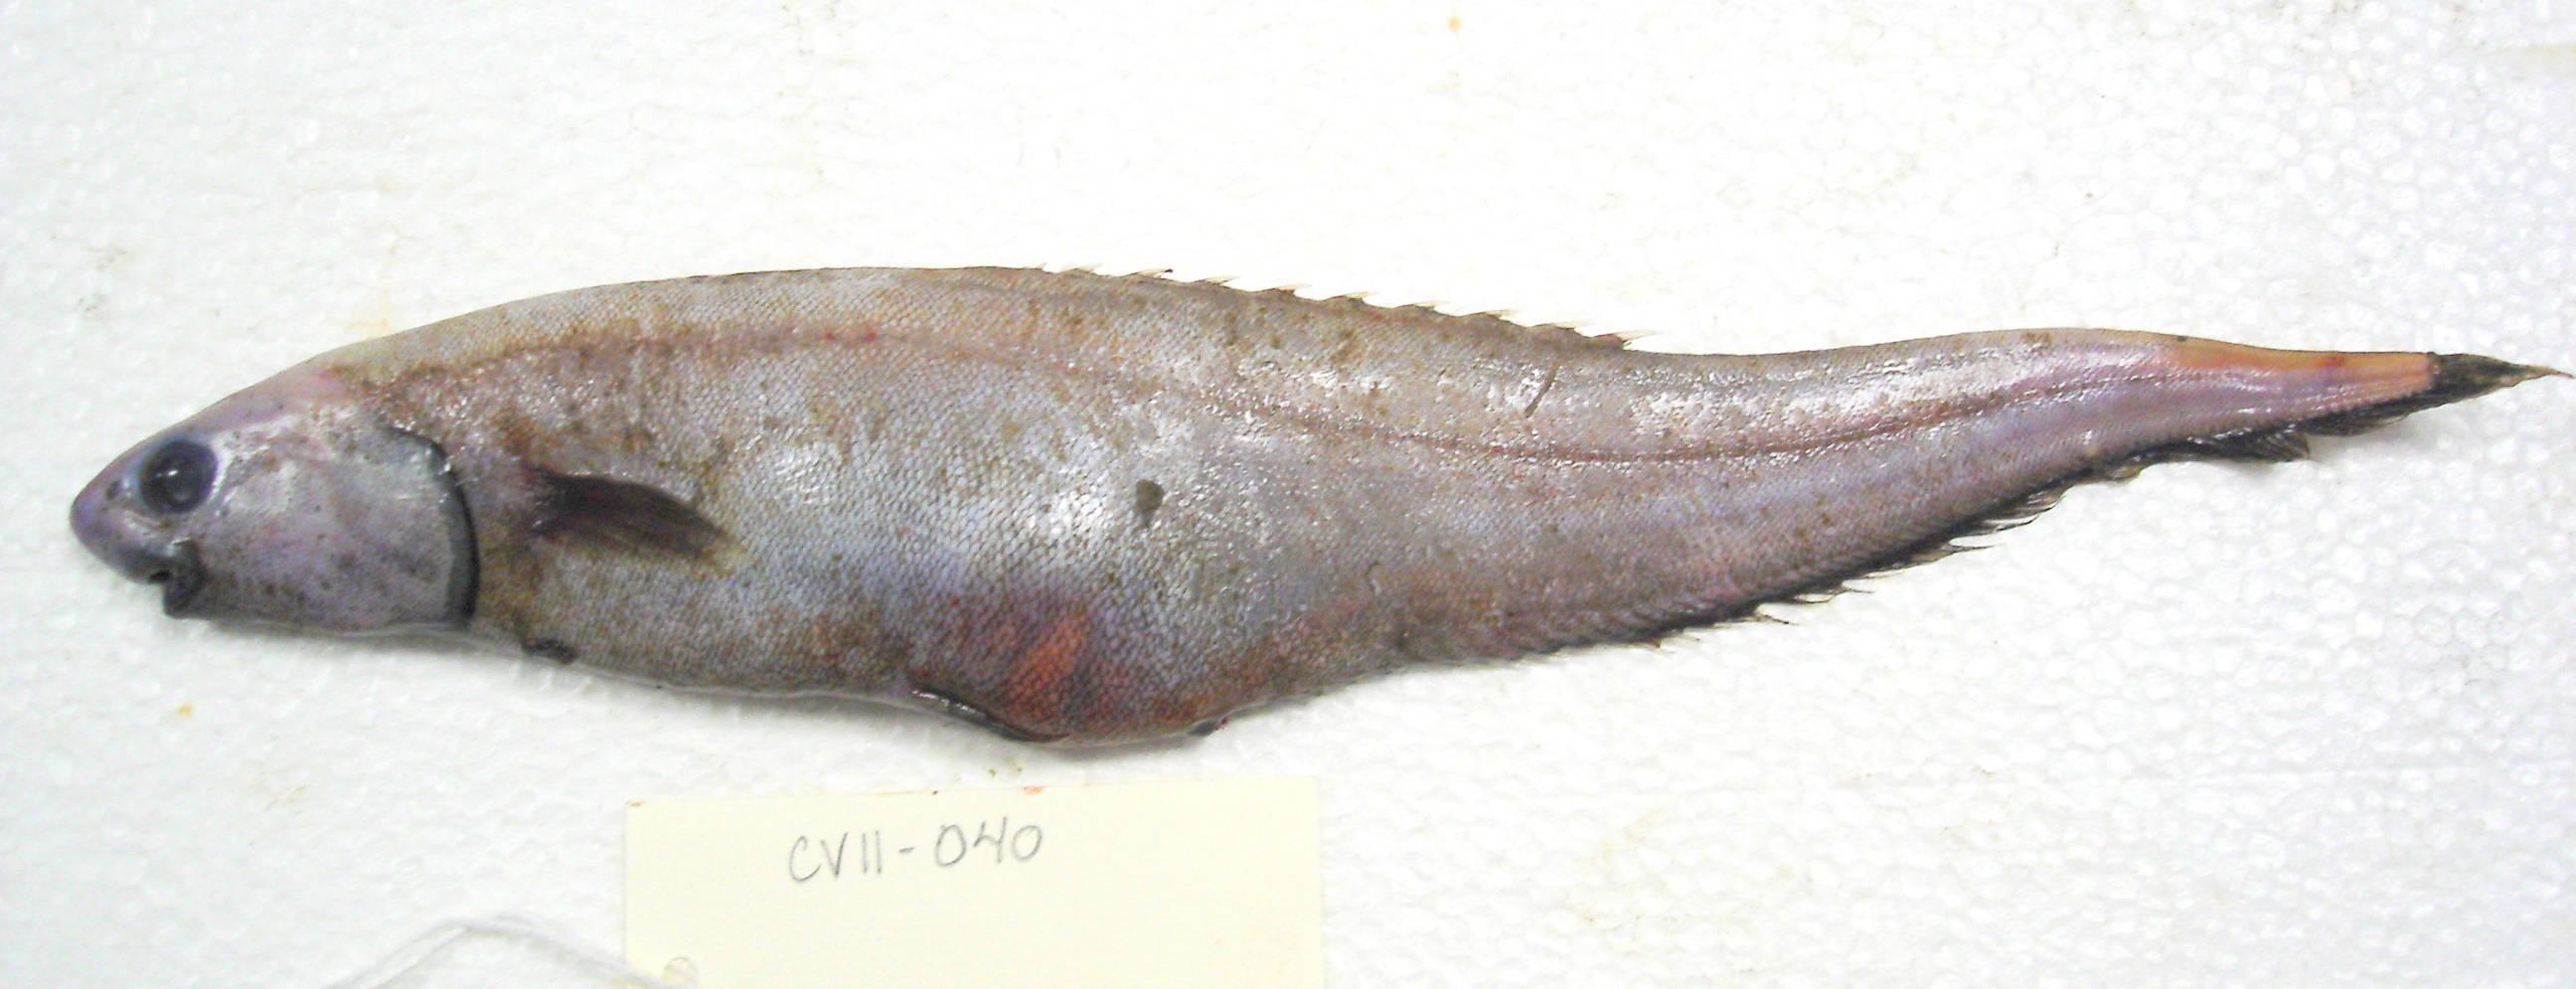 Image of Notacanthus bonaparte